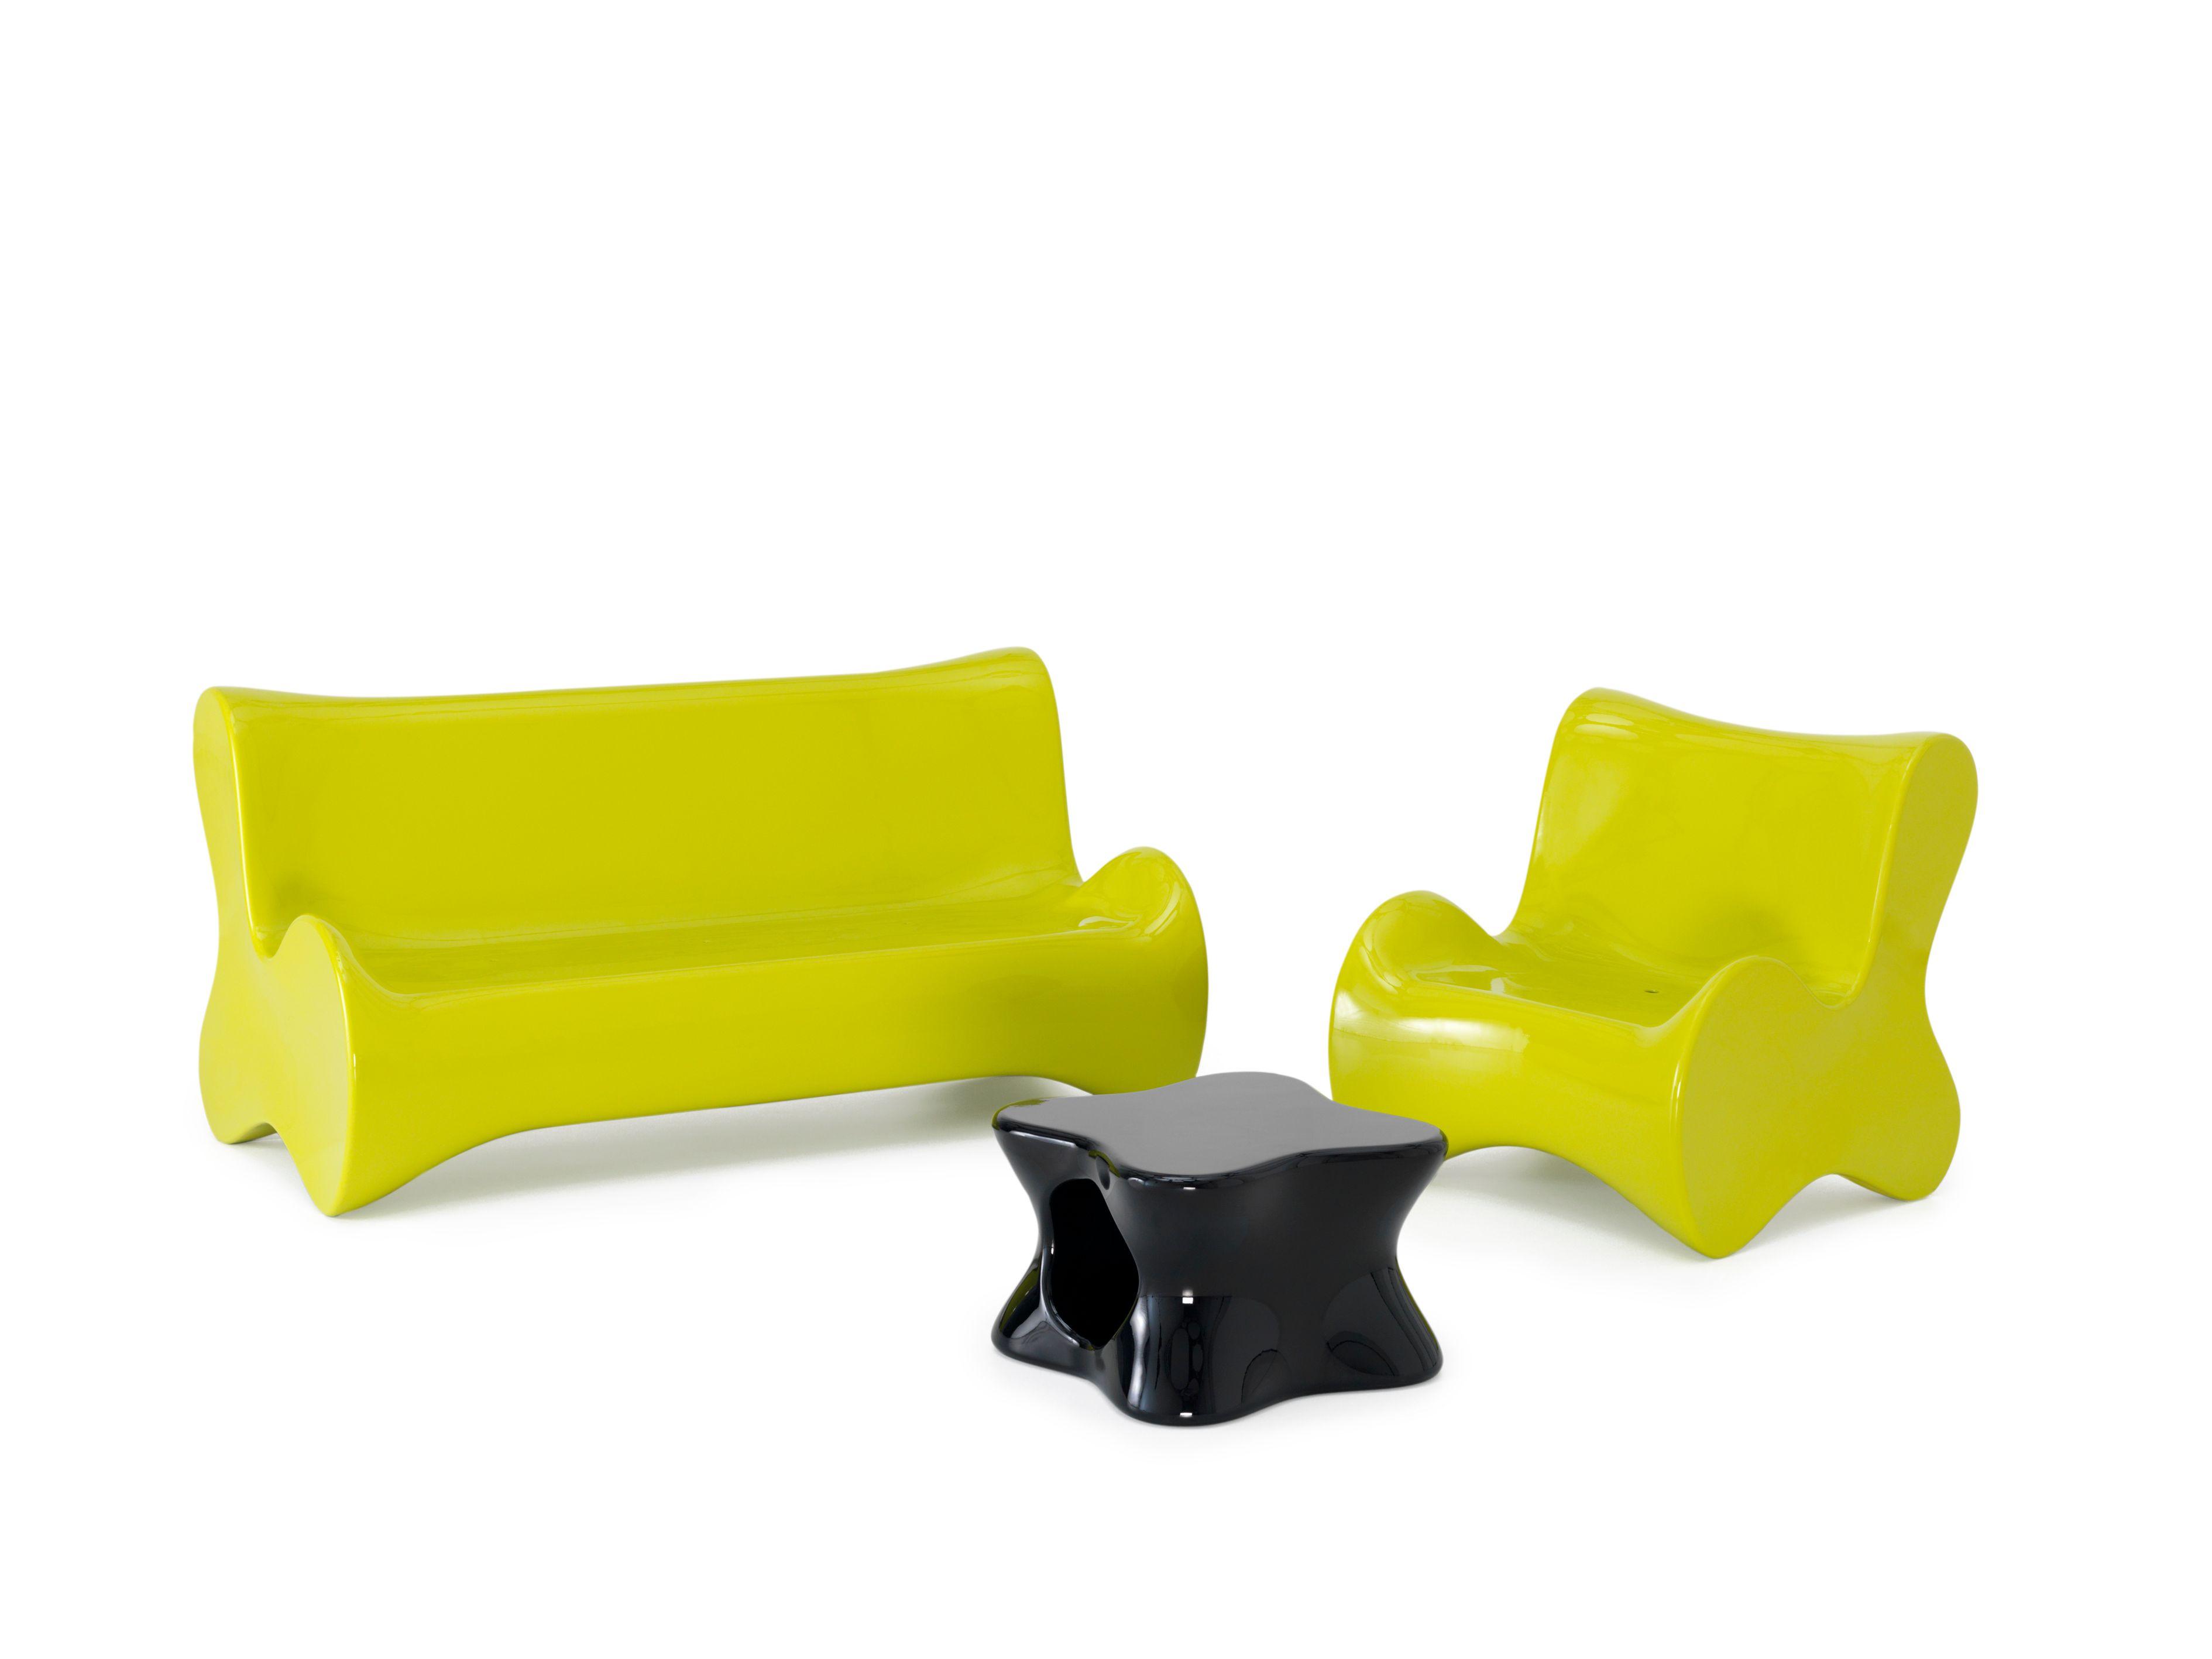 garden sofa doux 180 doux collection by vondom design karim rashid. Black Bedroom Furniture Sets. Home Design Ideas